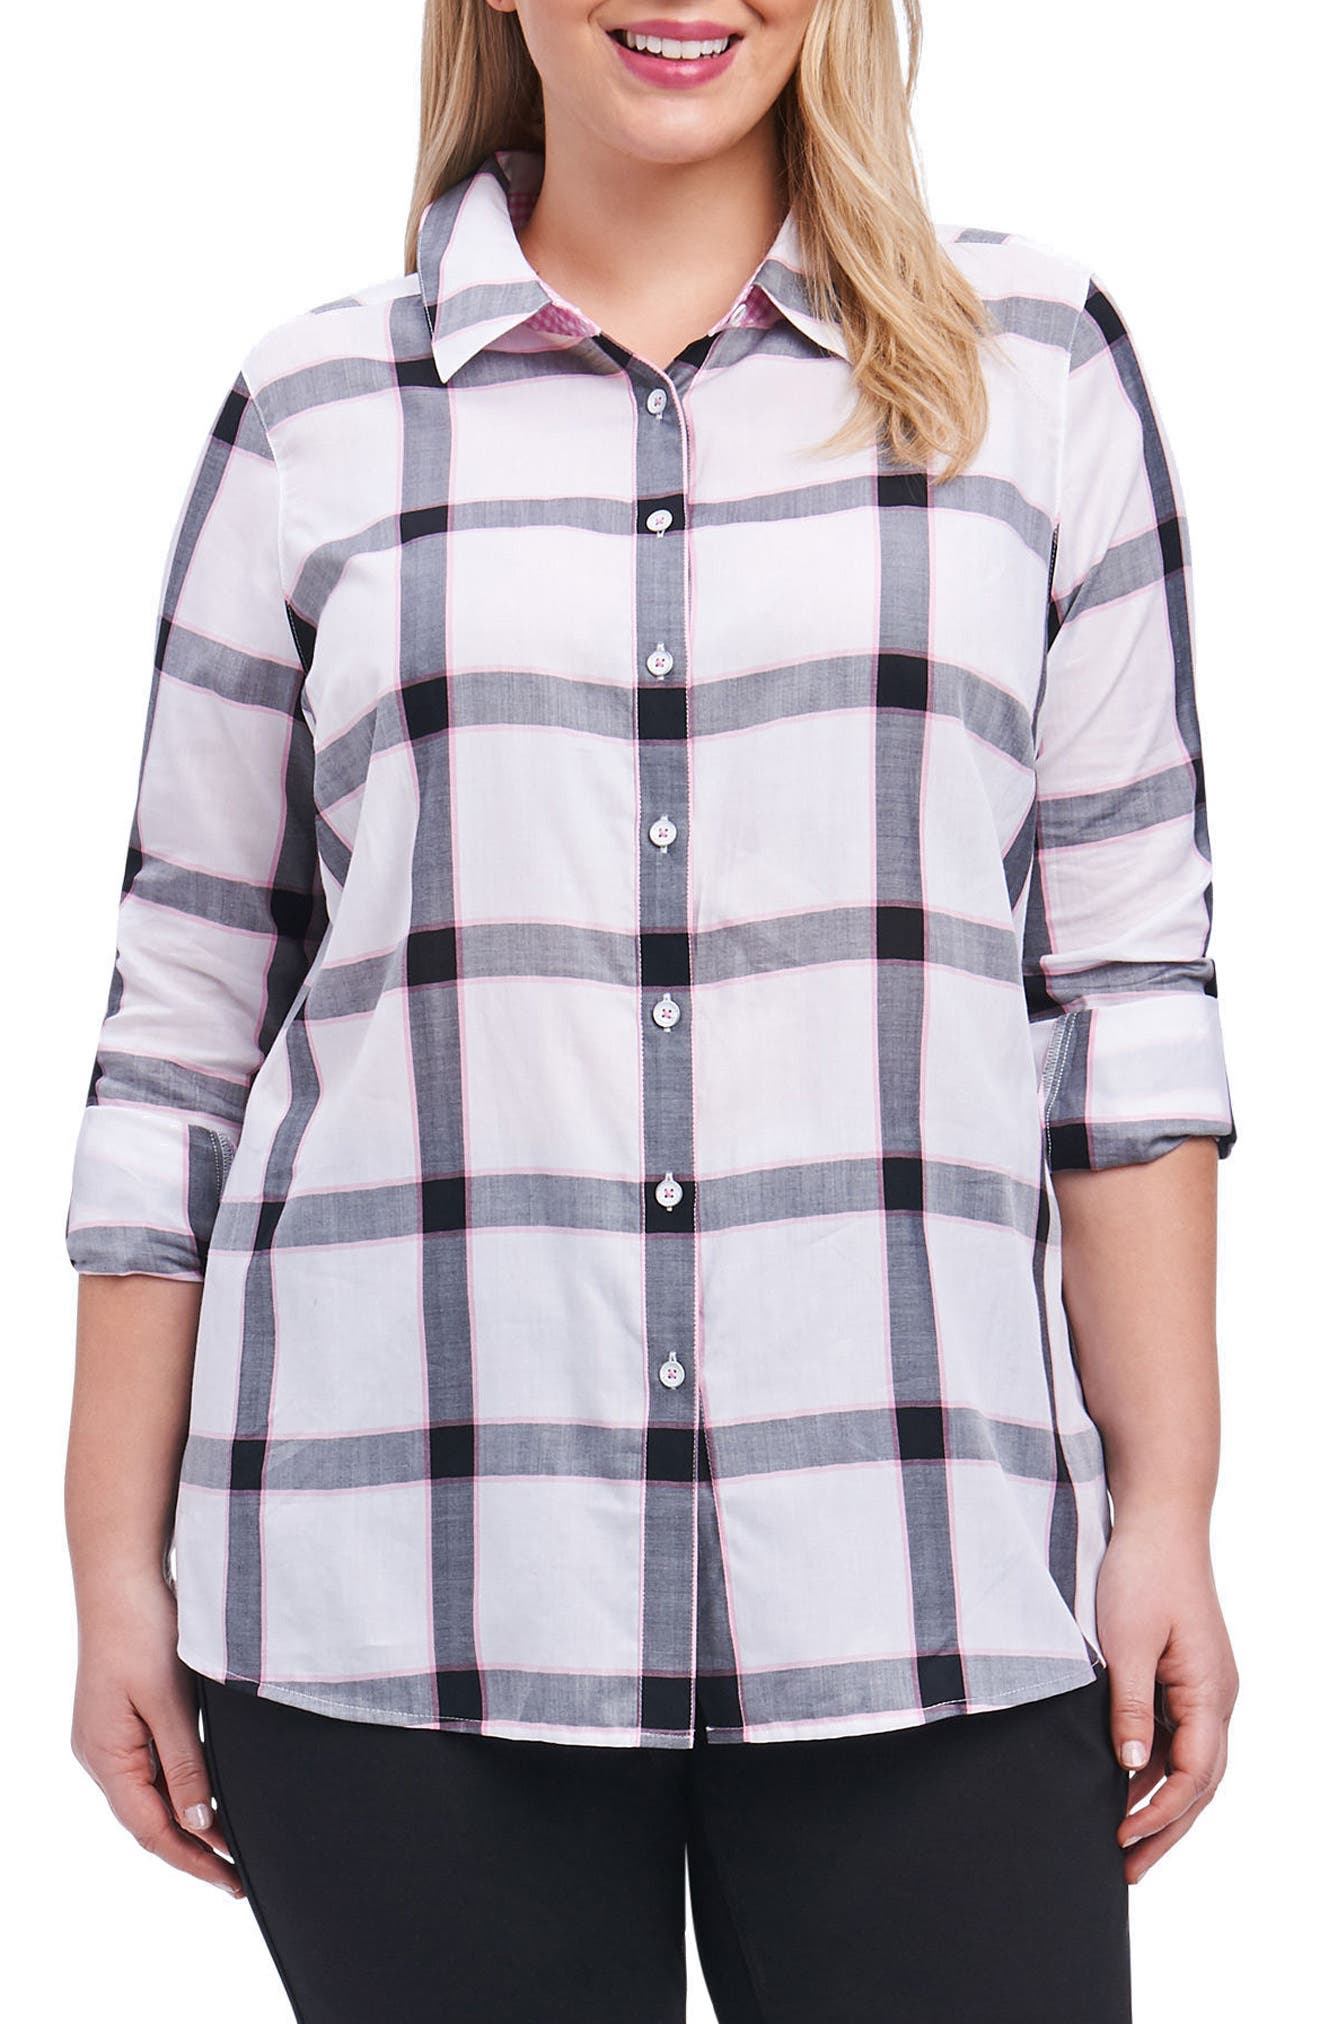 Alternate Image 1 Selected - Foxcroft Zoey Herringbone Plaid Shirt (Plus Size)